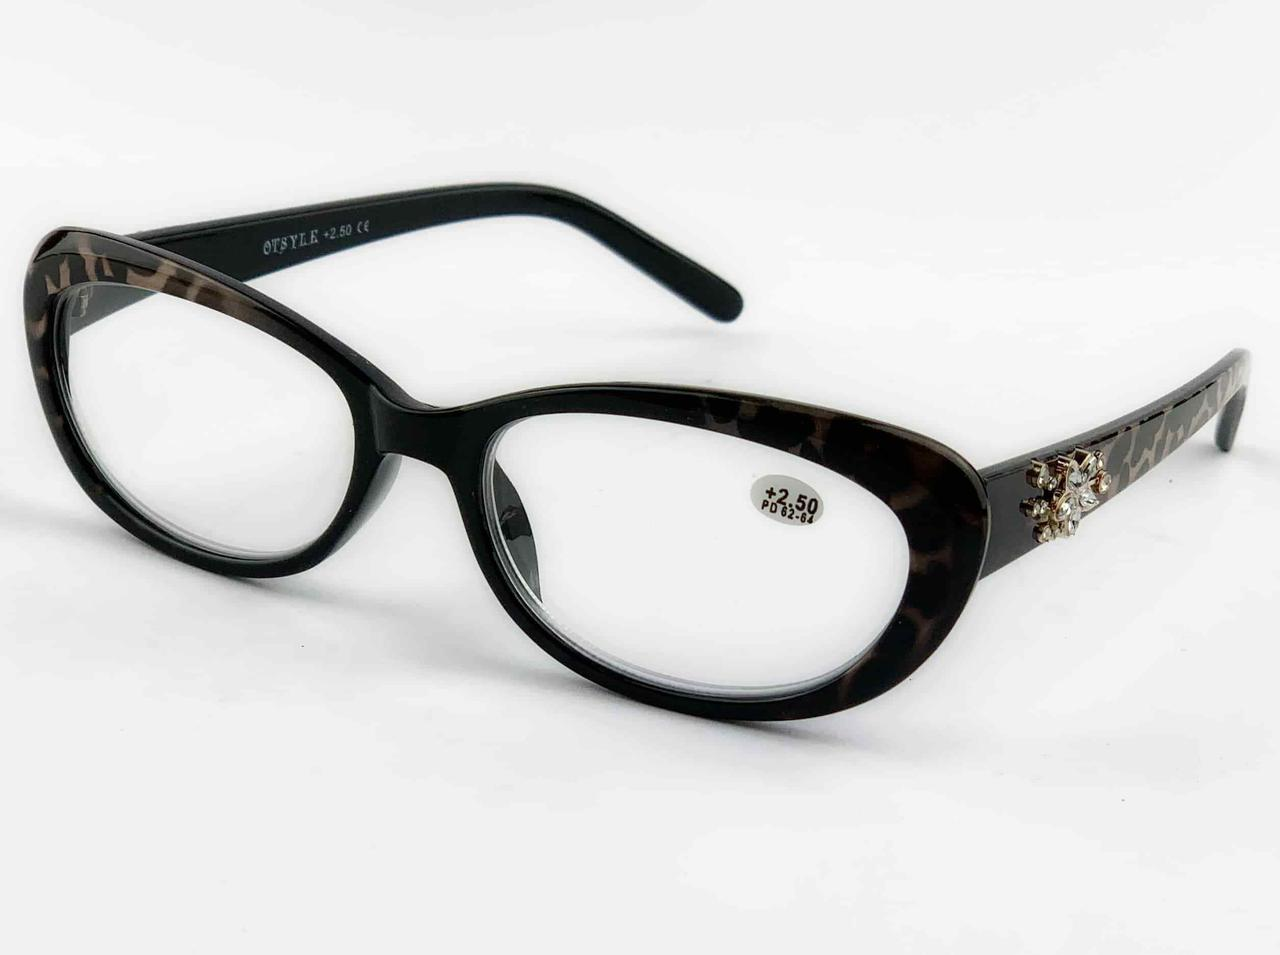 Очки с диоптриями Otsyle 6063 С1/С3